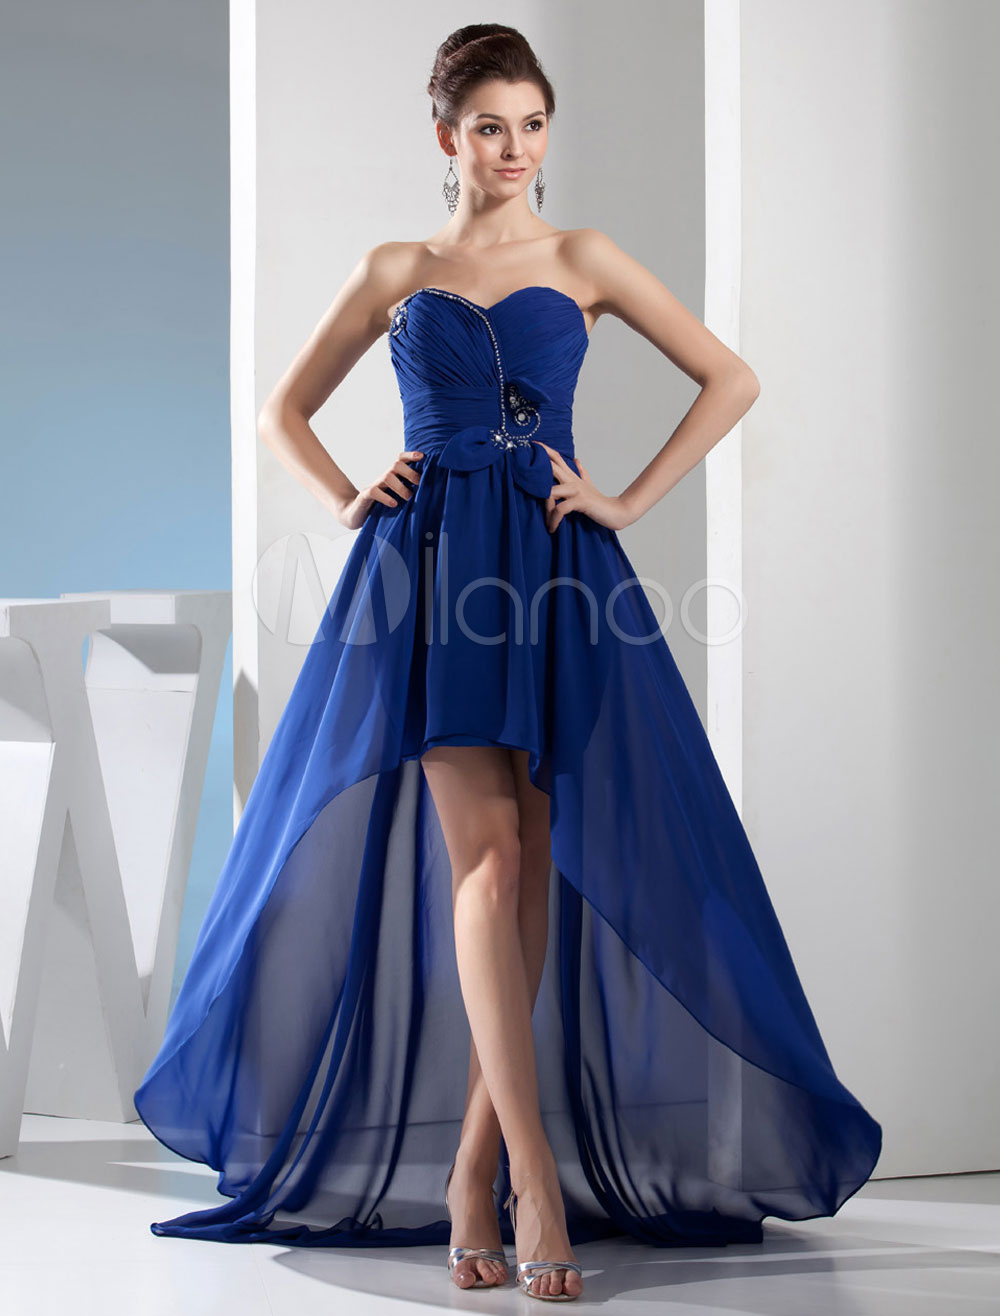 High-Low Homecoming Dress Strapless Sweetheart Beading Court Train Chiffon Blue Prom Dress Milanoo